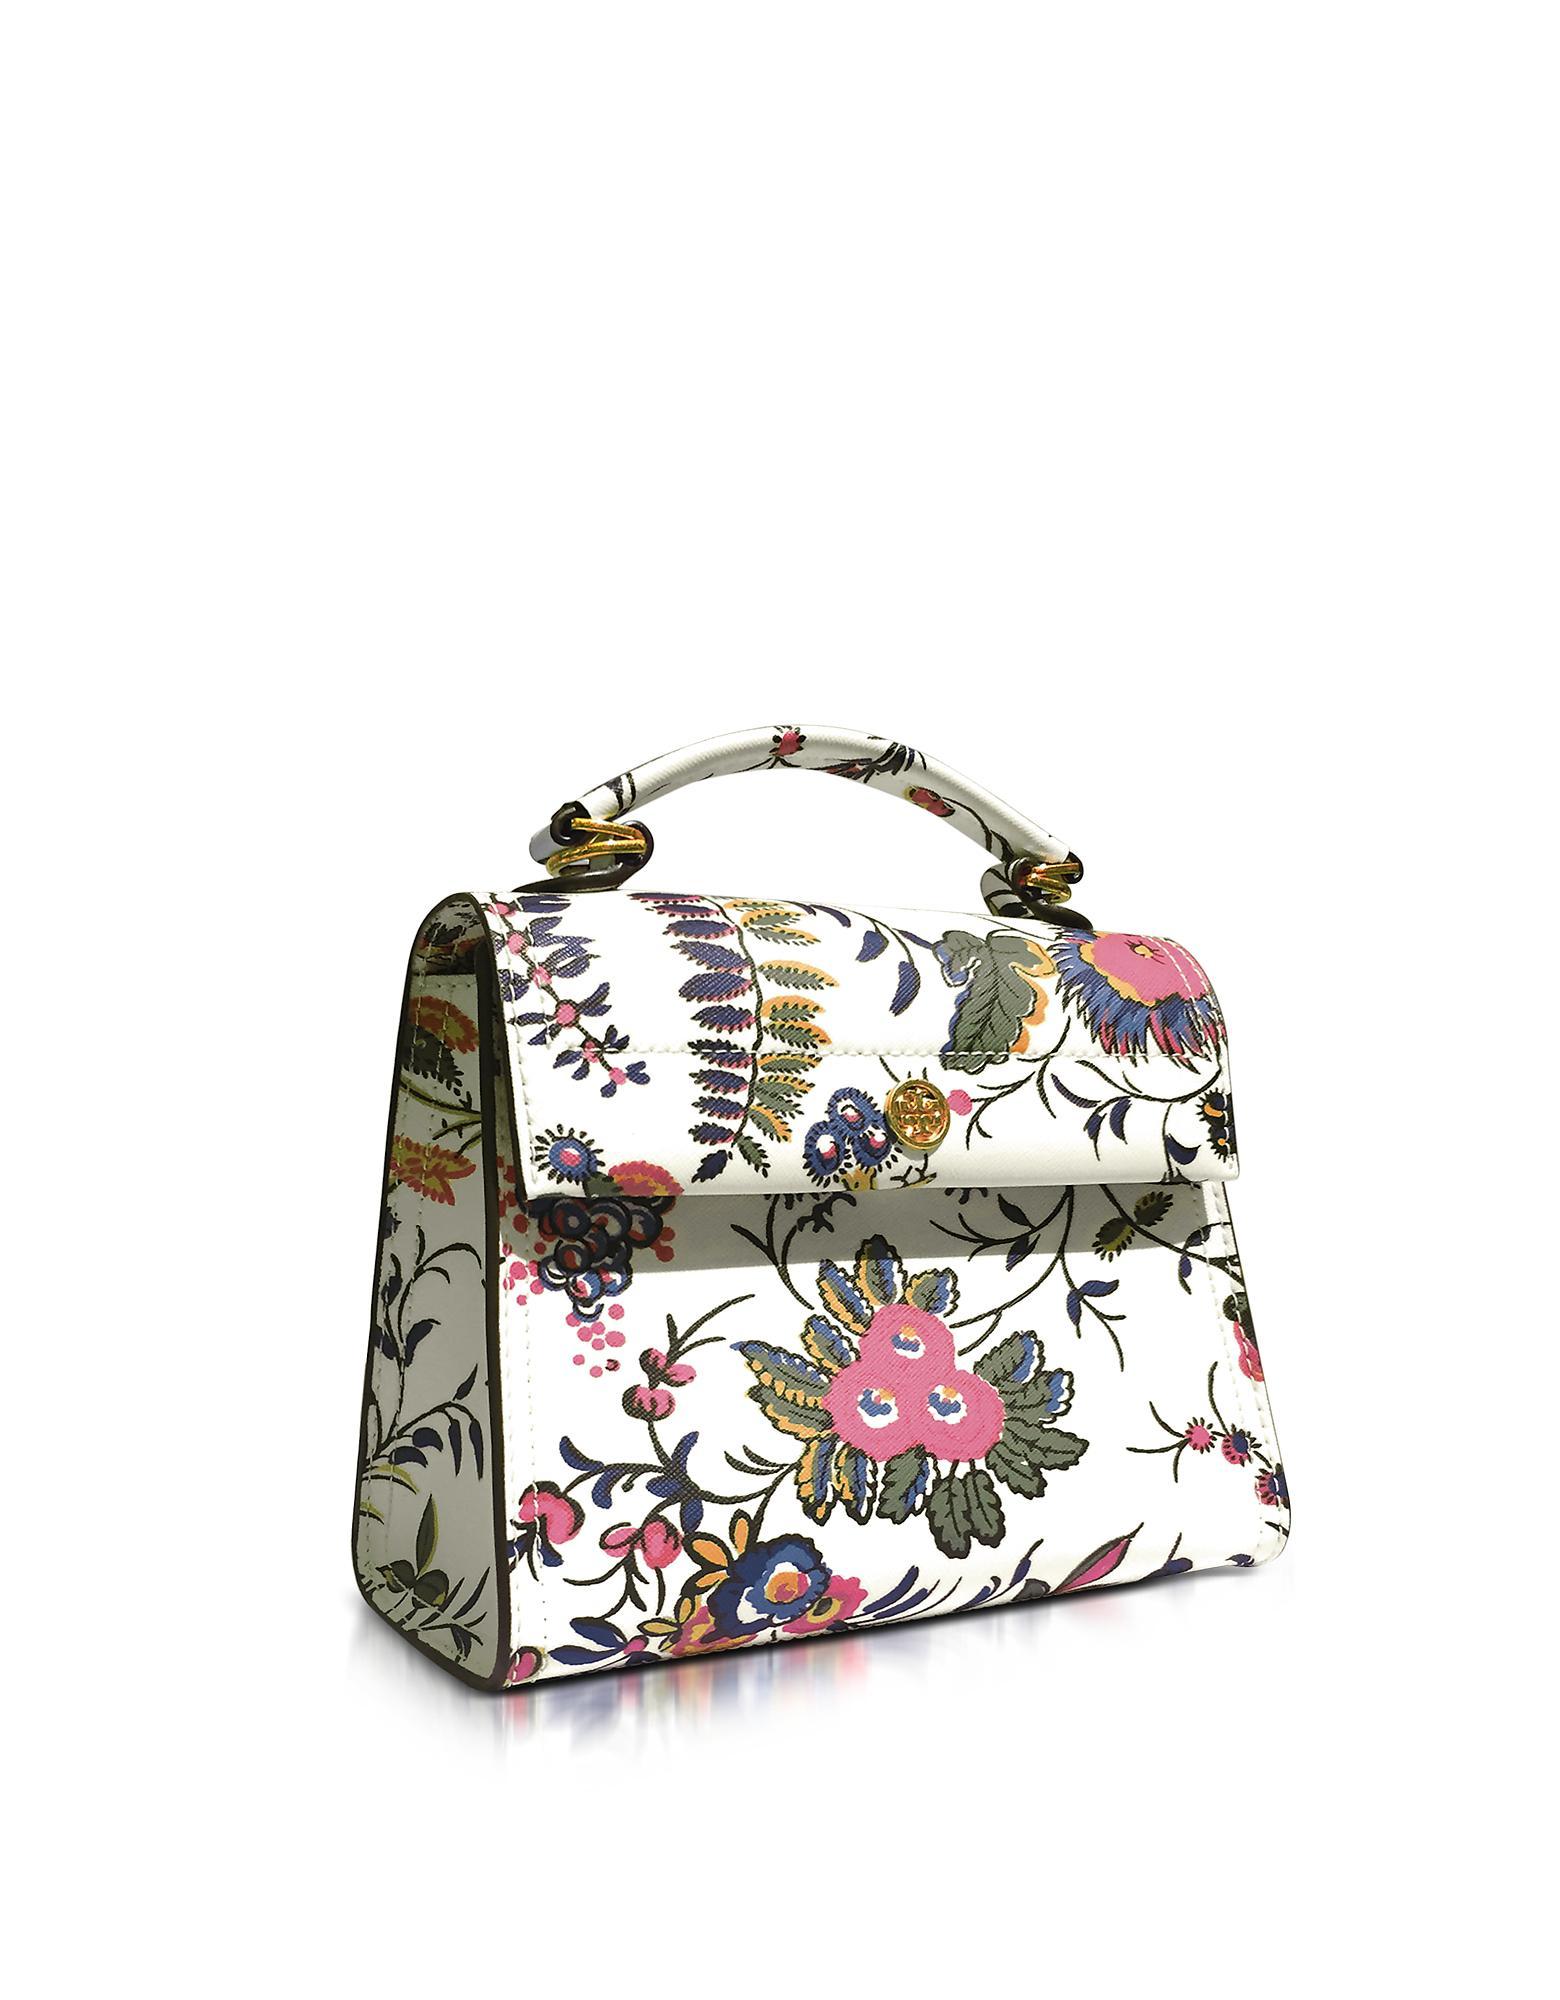 da92c8d00d5 Lyst - Tory Burch Parker Gabriella Floral Print Leather Small ...